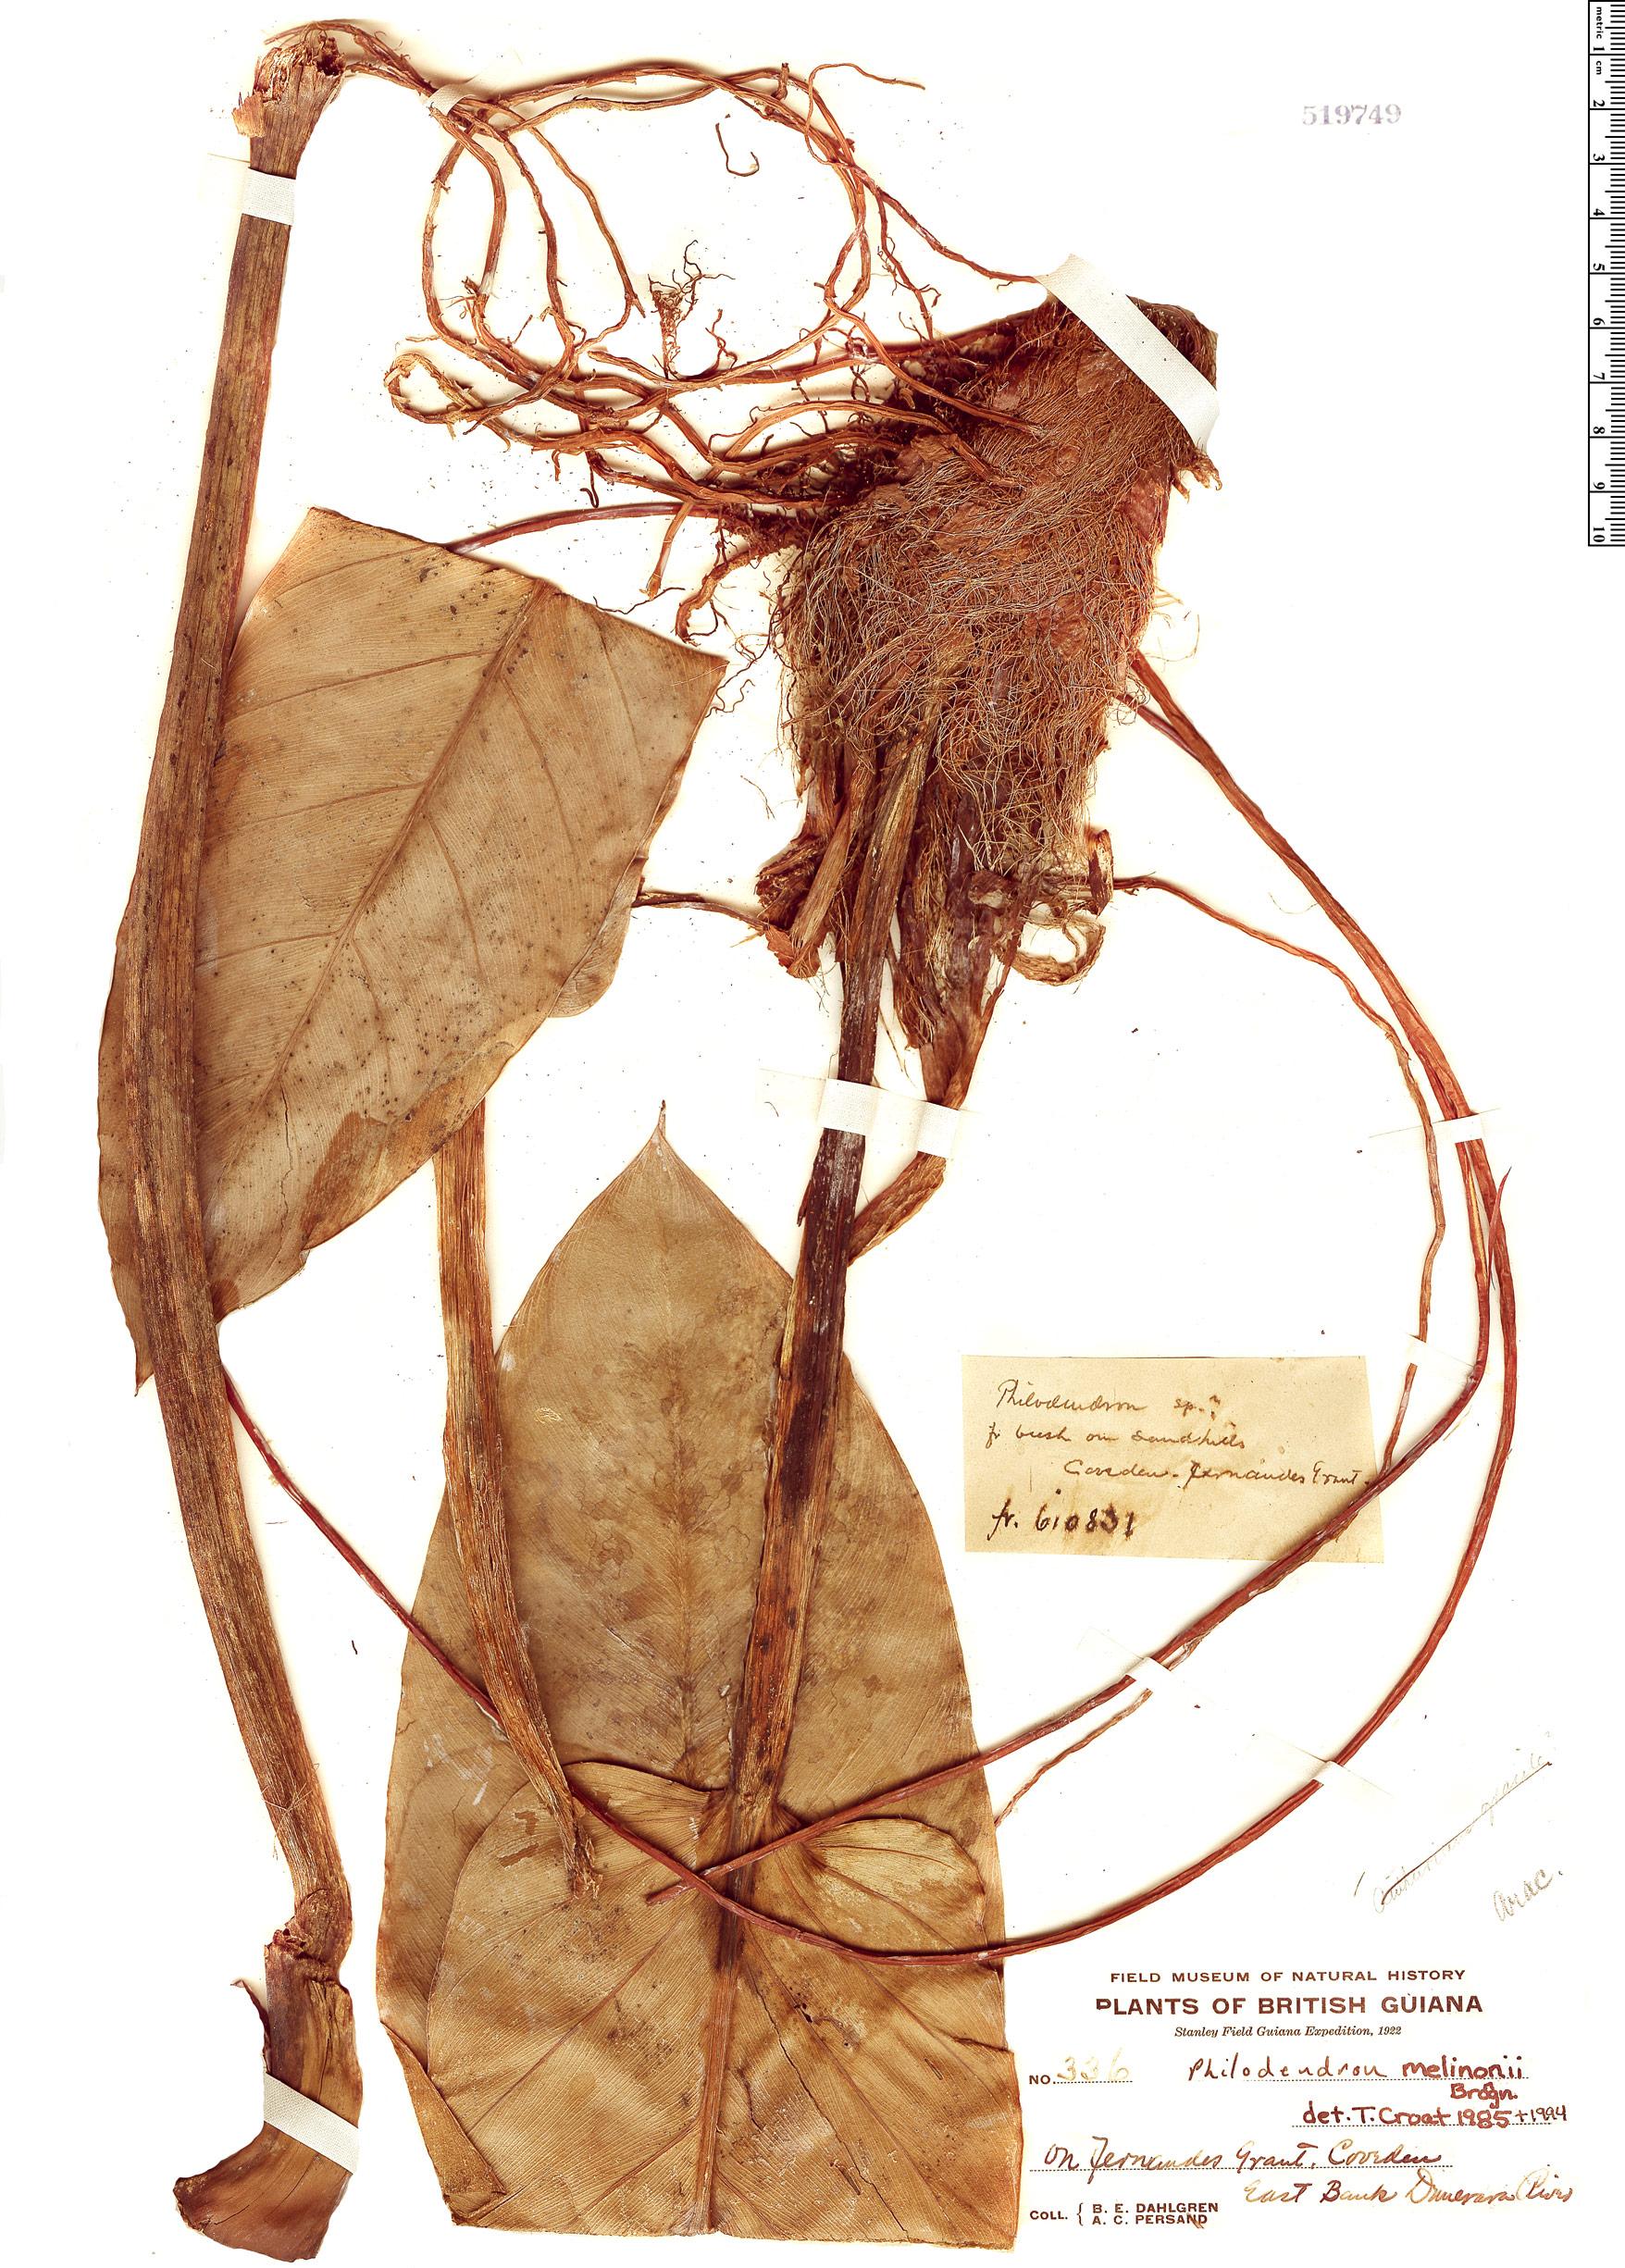 Specimen: Philodendron melinonii